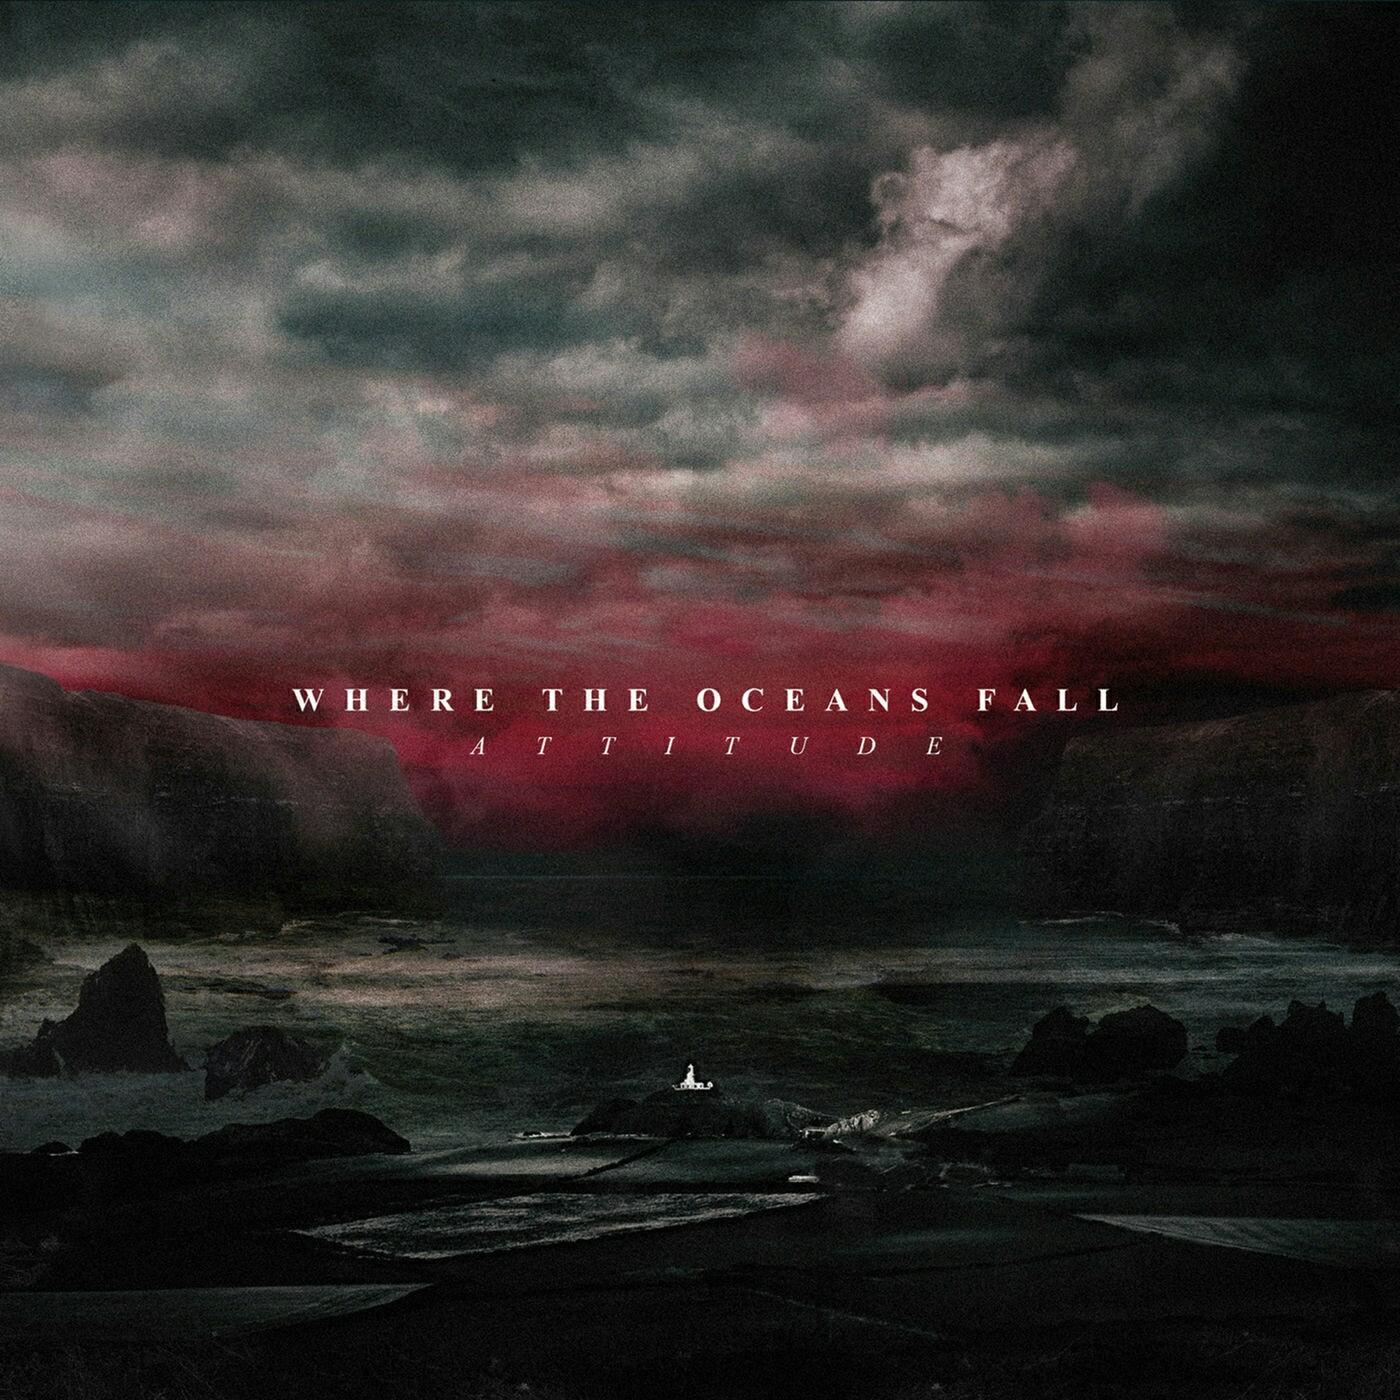 Where The Oceans Fall – Attitude (2019)